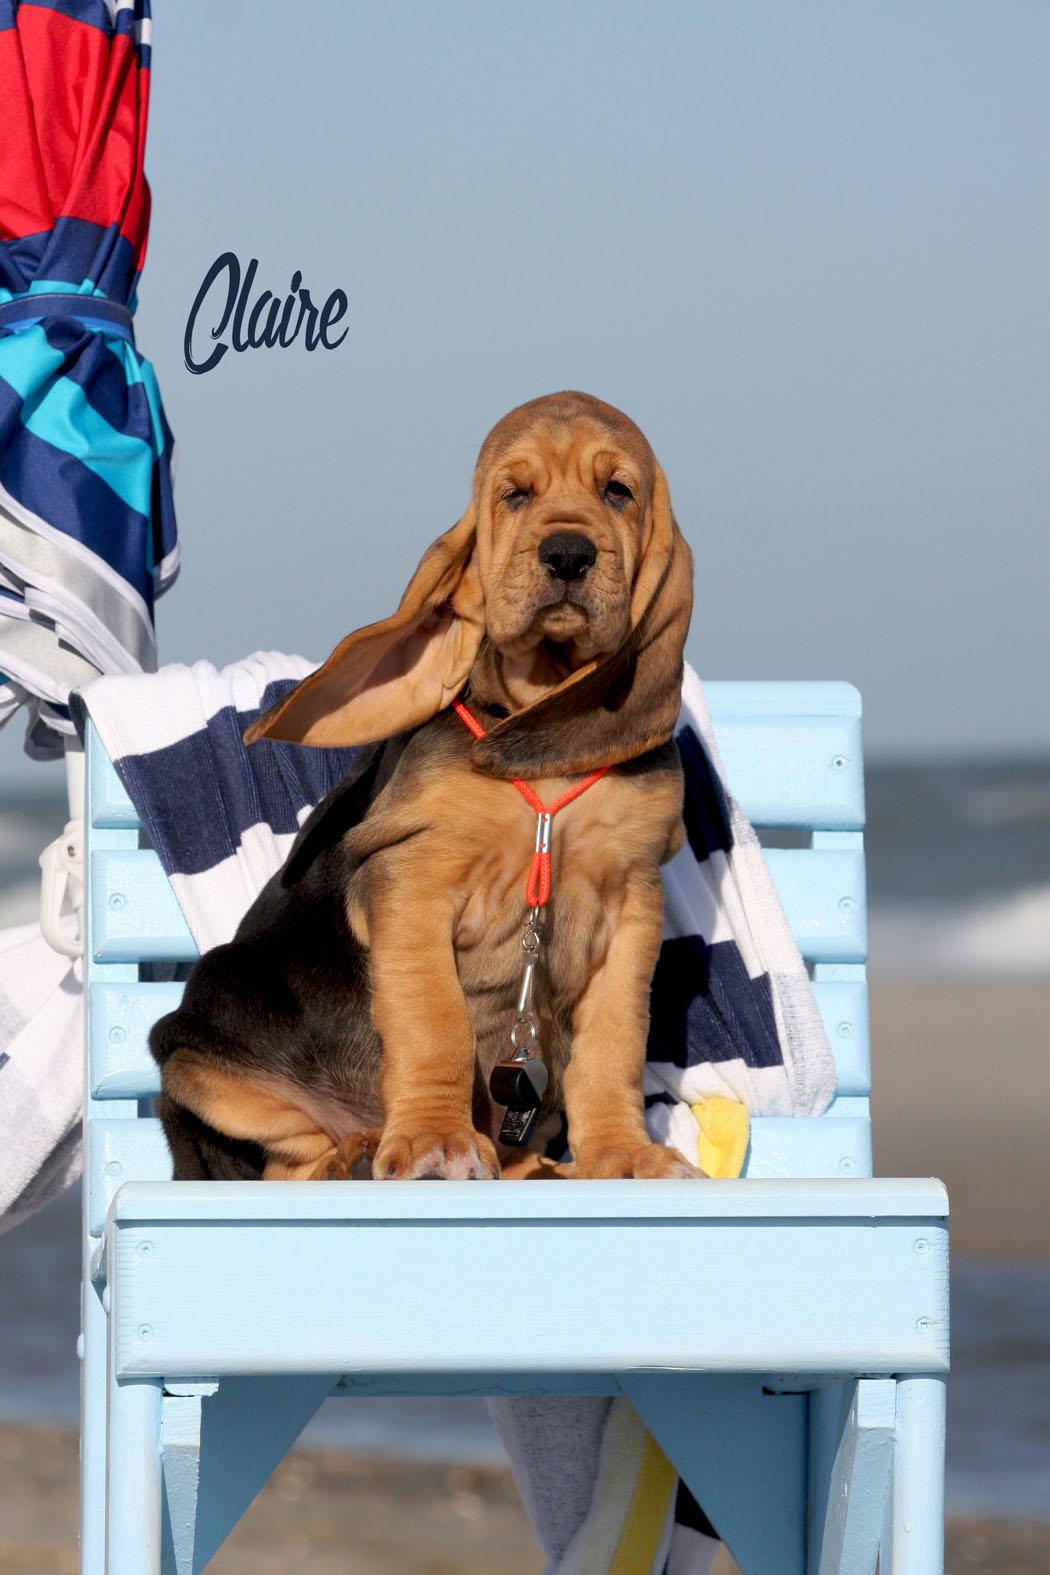 Claire.jpg